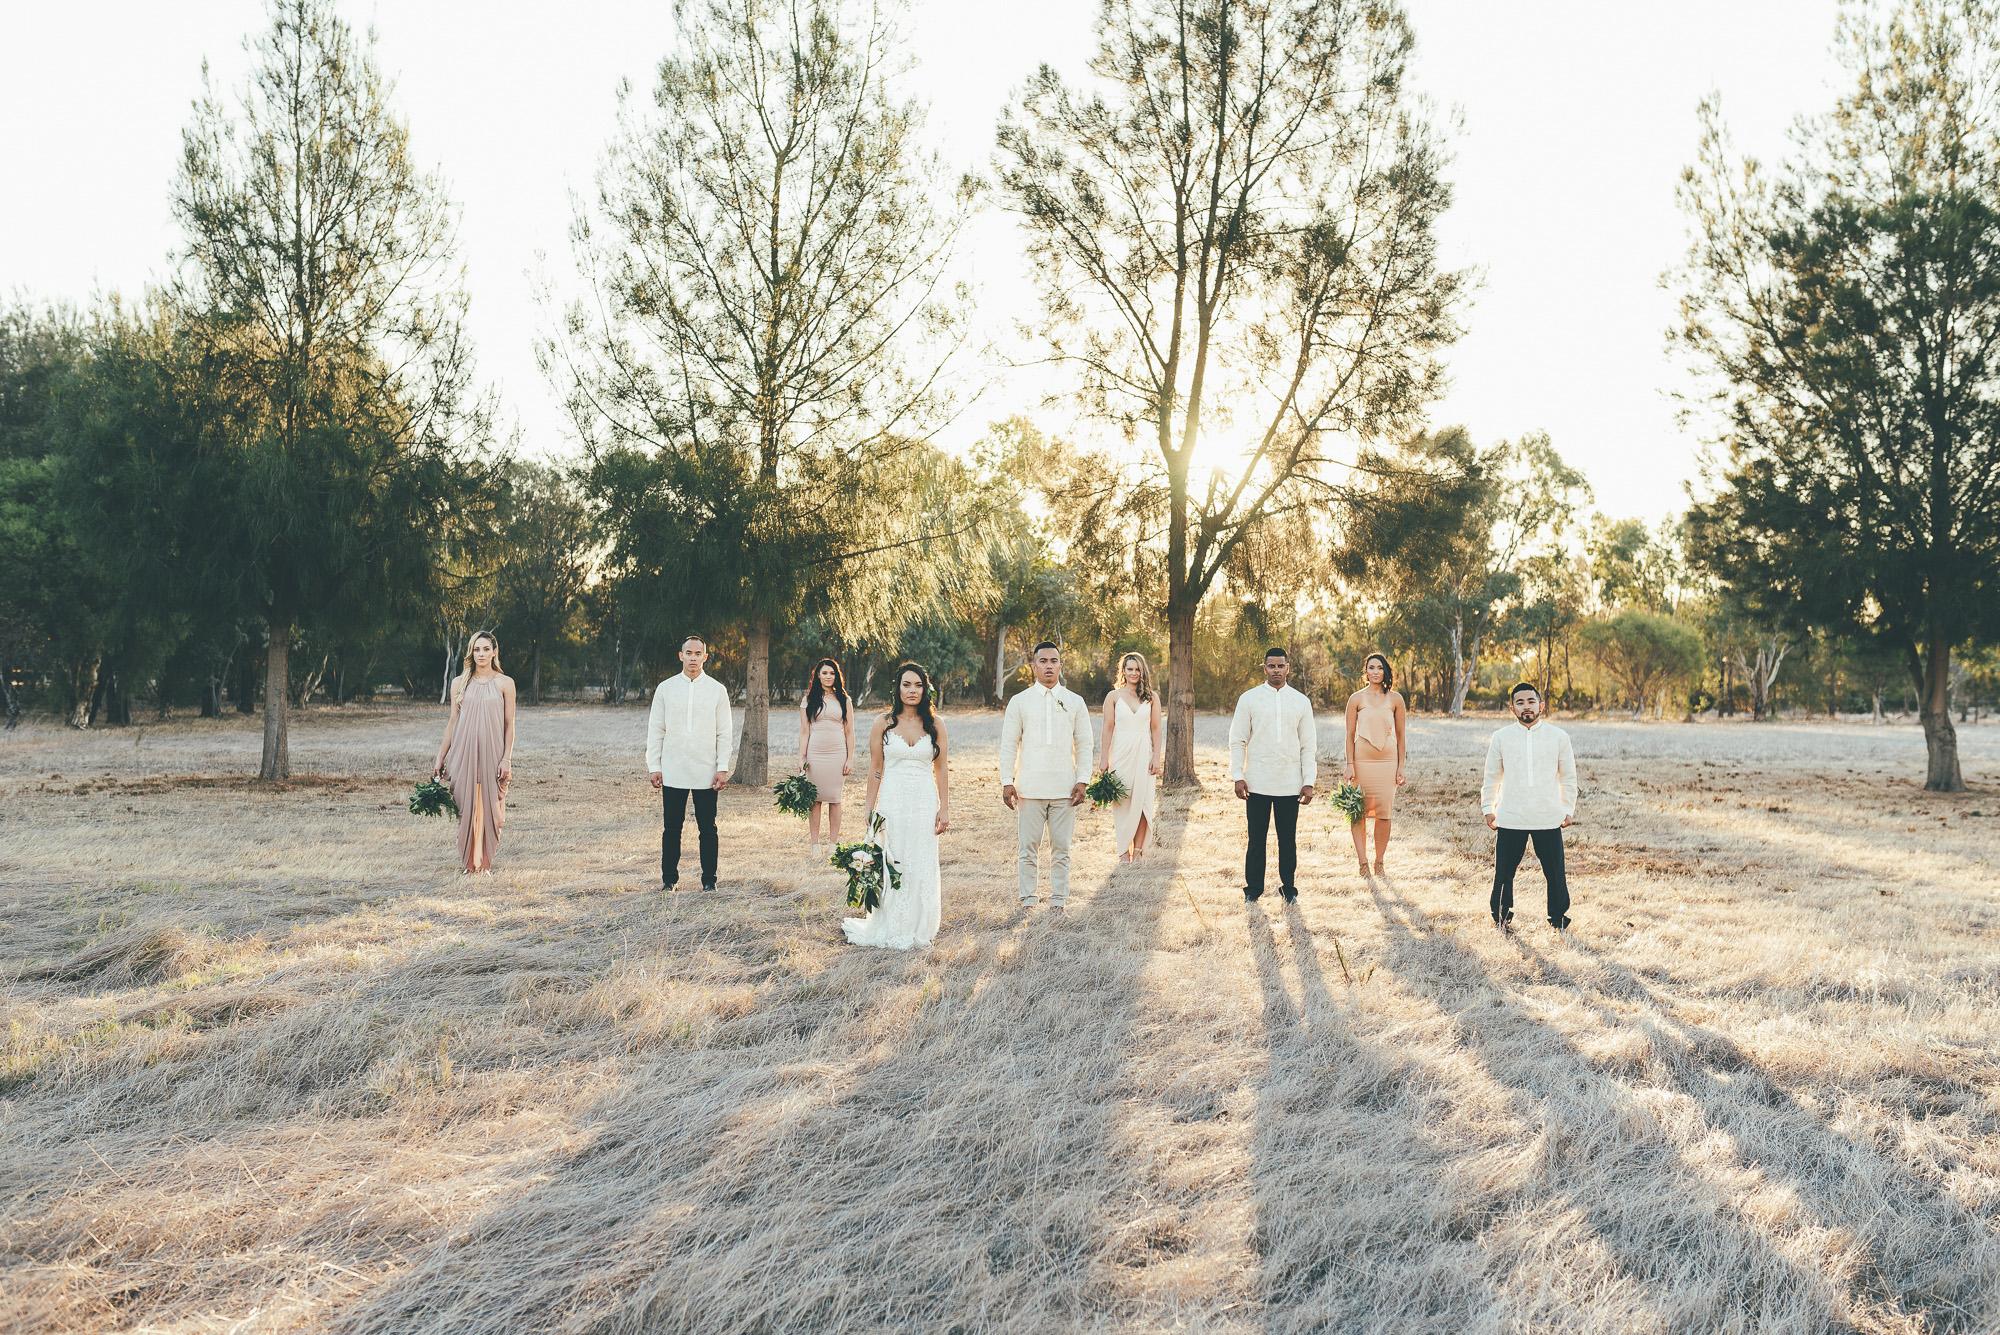 wedding-photographer-outdoor-casual-styled-los-angeles-australia-california-international-earthbound -66.jpg